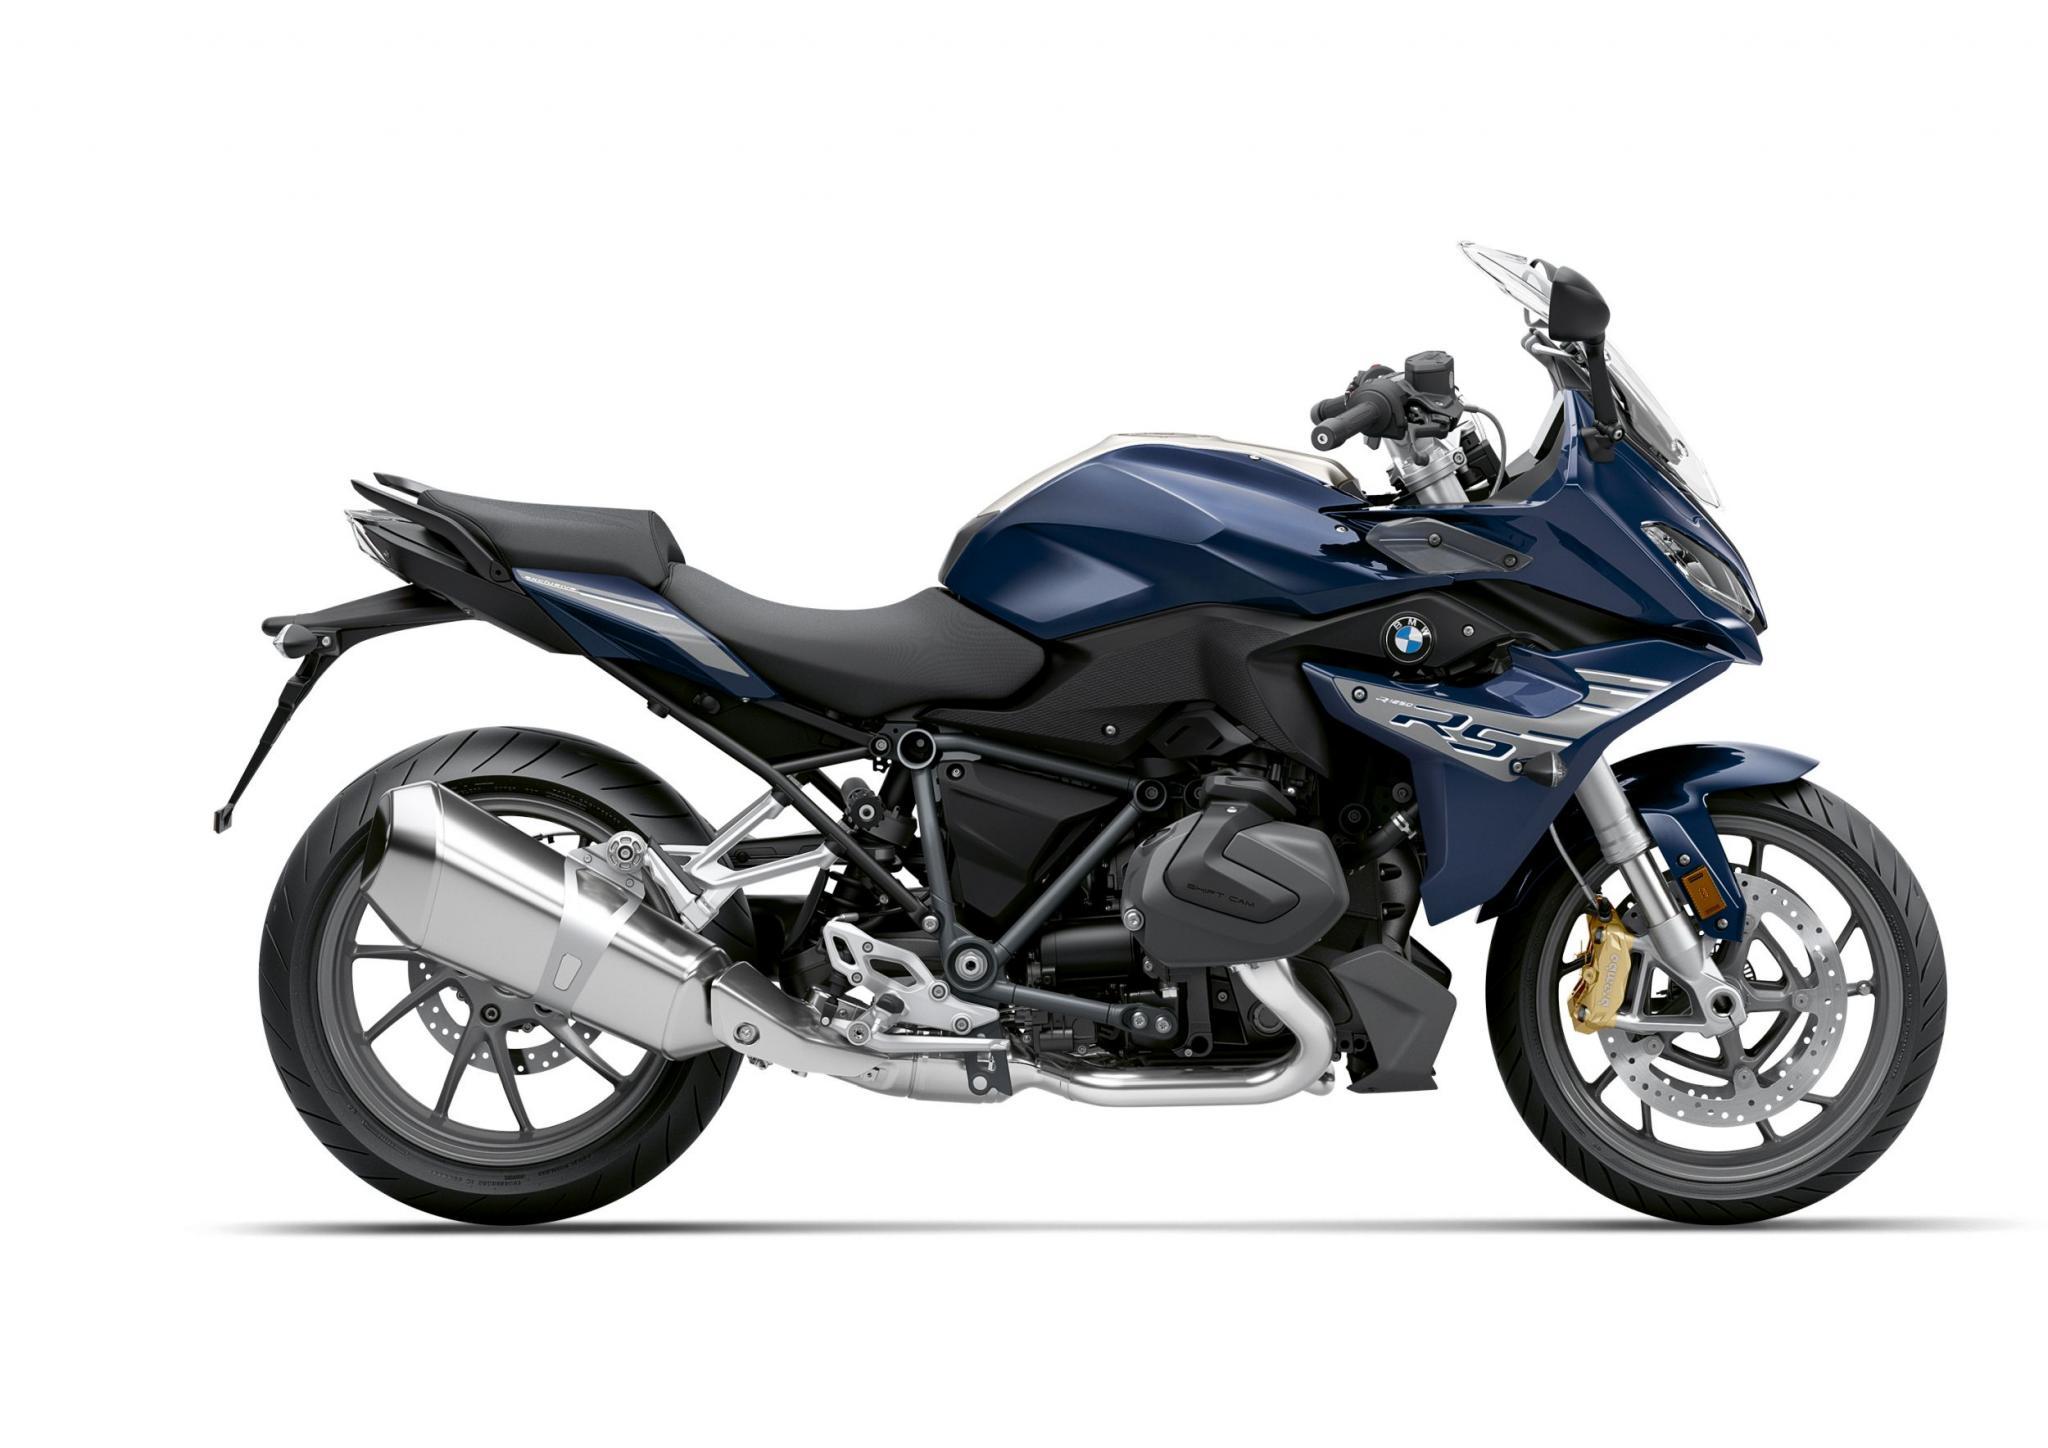 Bmw R 1250 Rs 2019 Modellnews